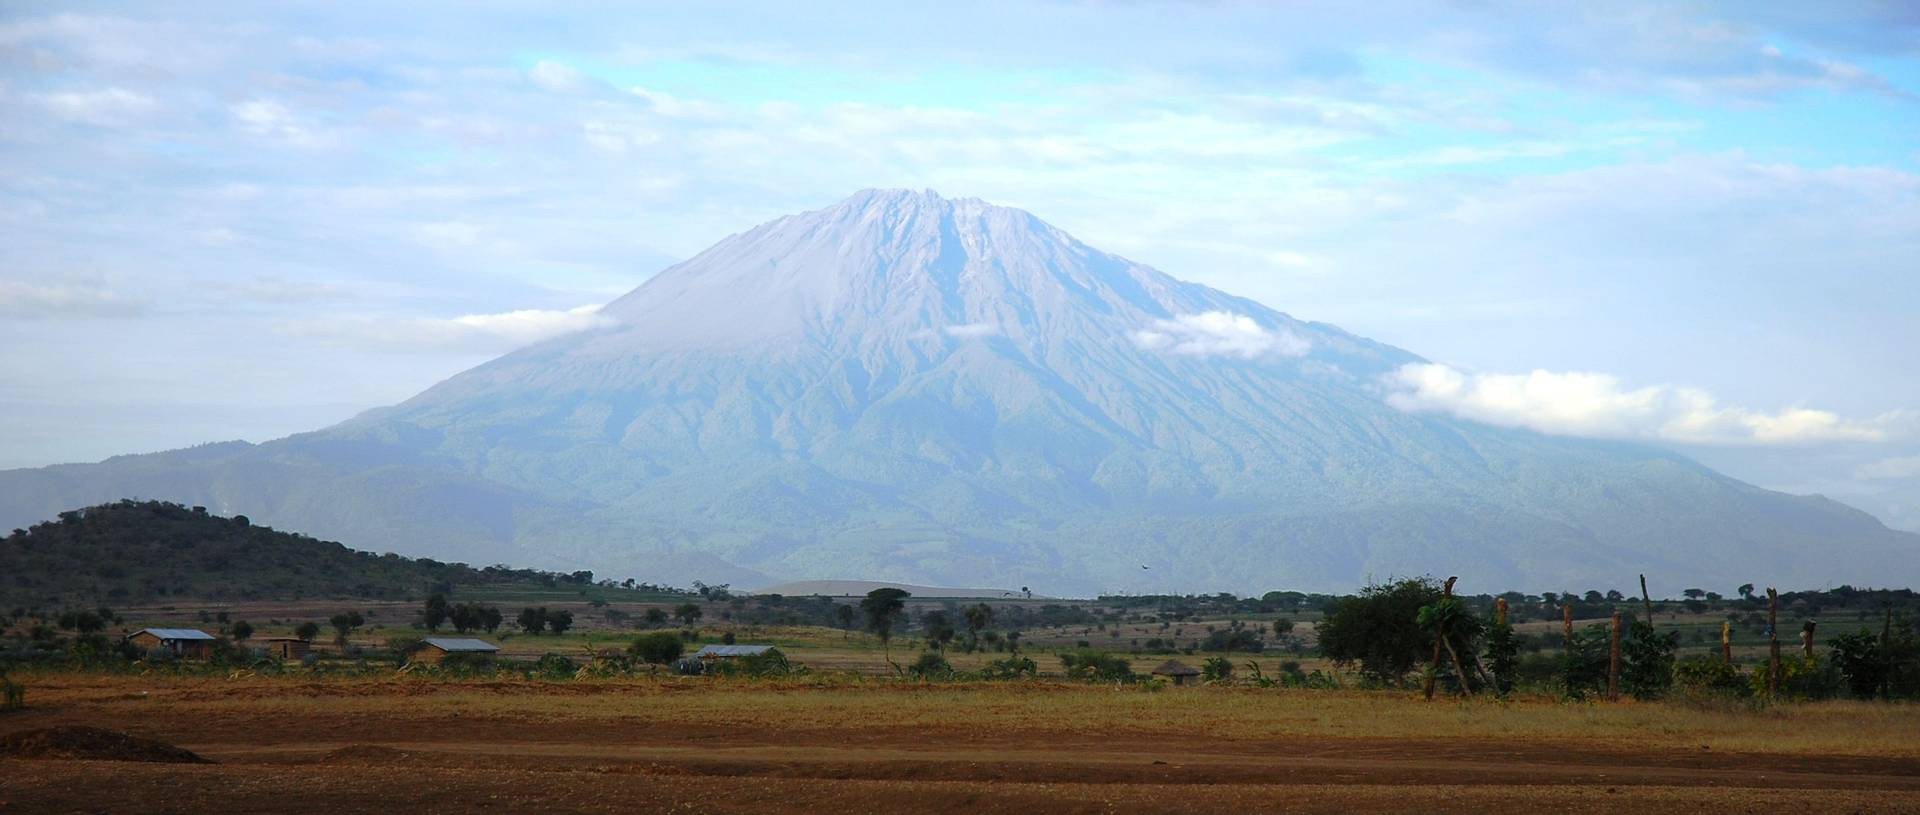 Views Of Kilimanjaro